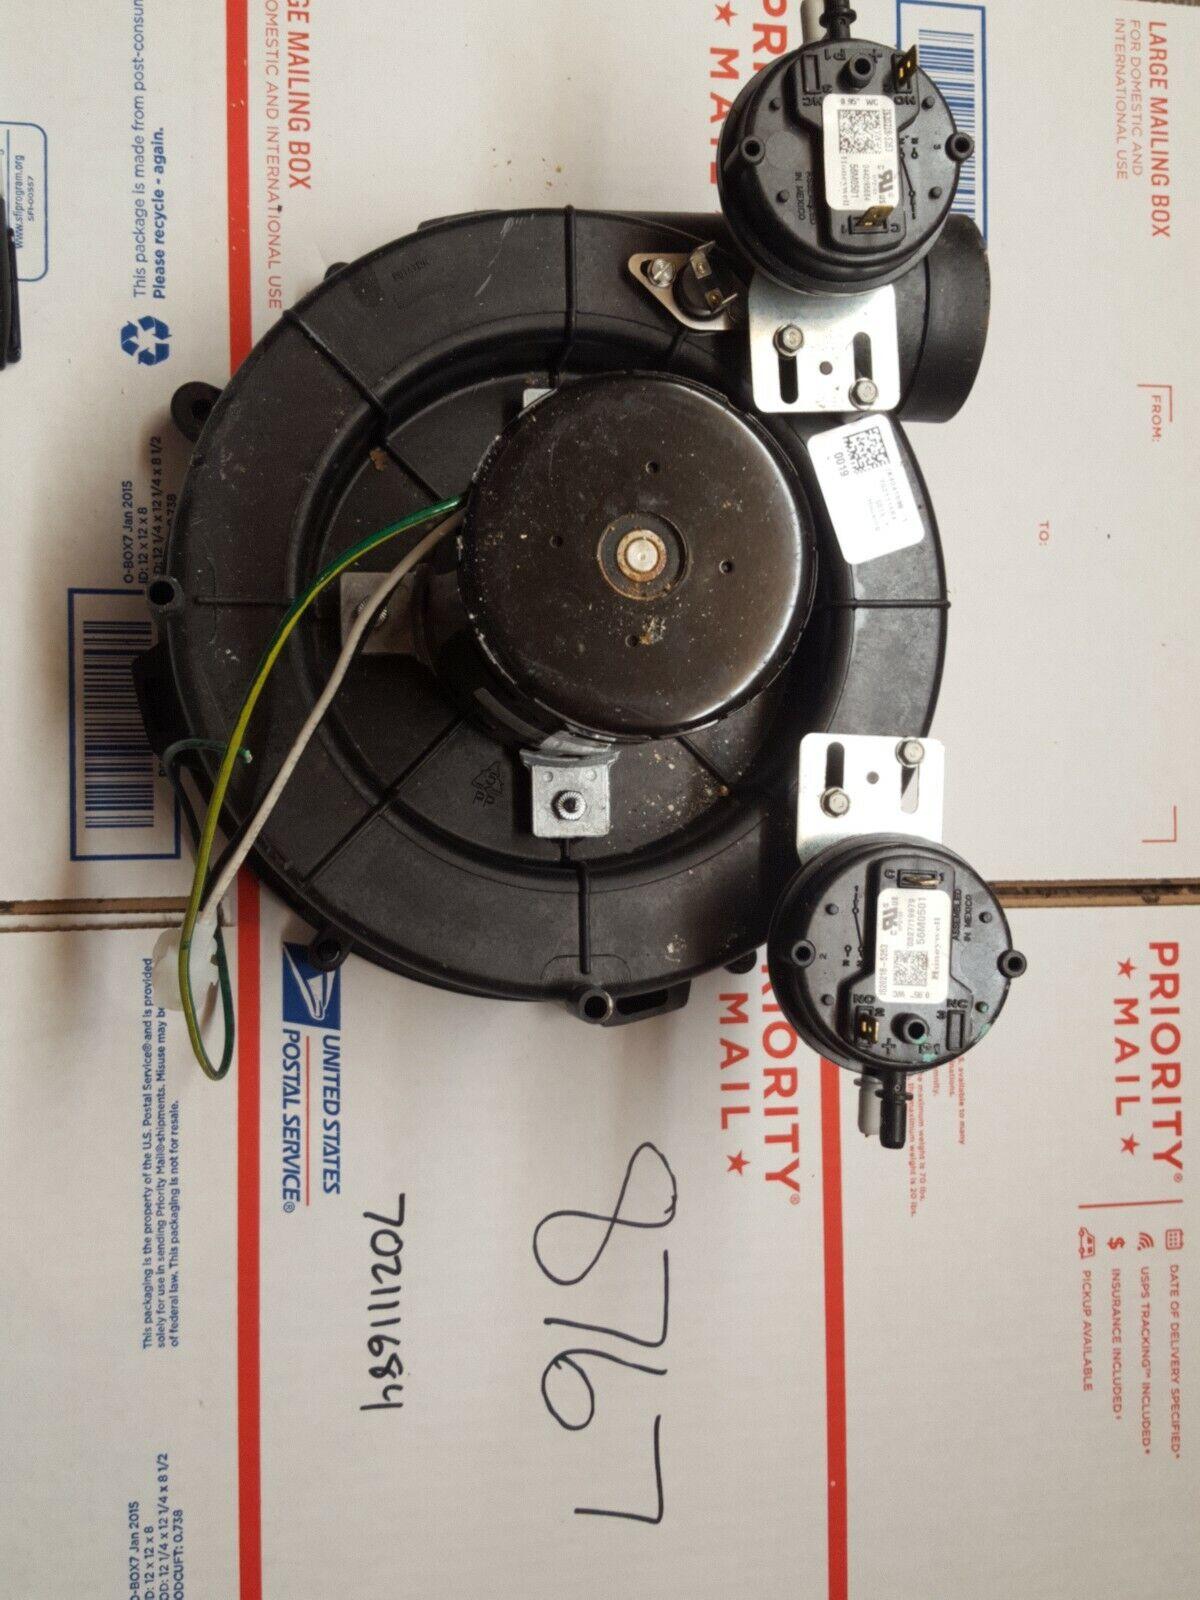 Fasco D701 Wiring Diagram. . Wiring Diagram on